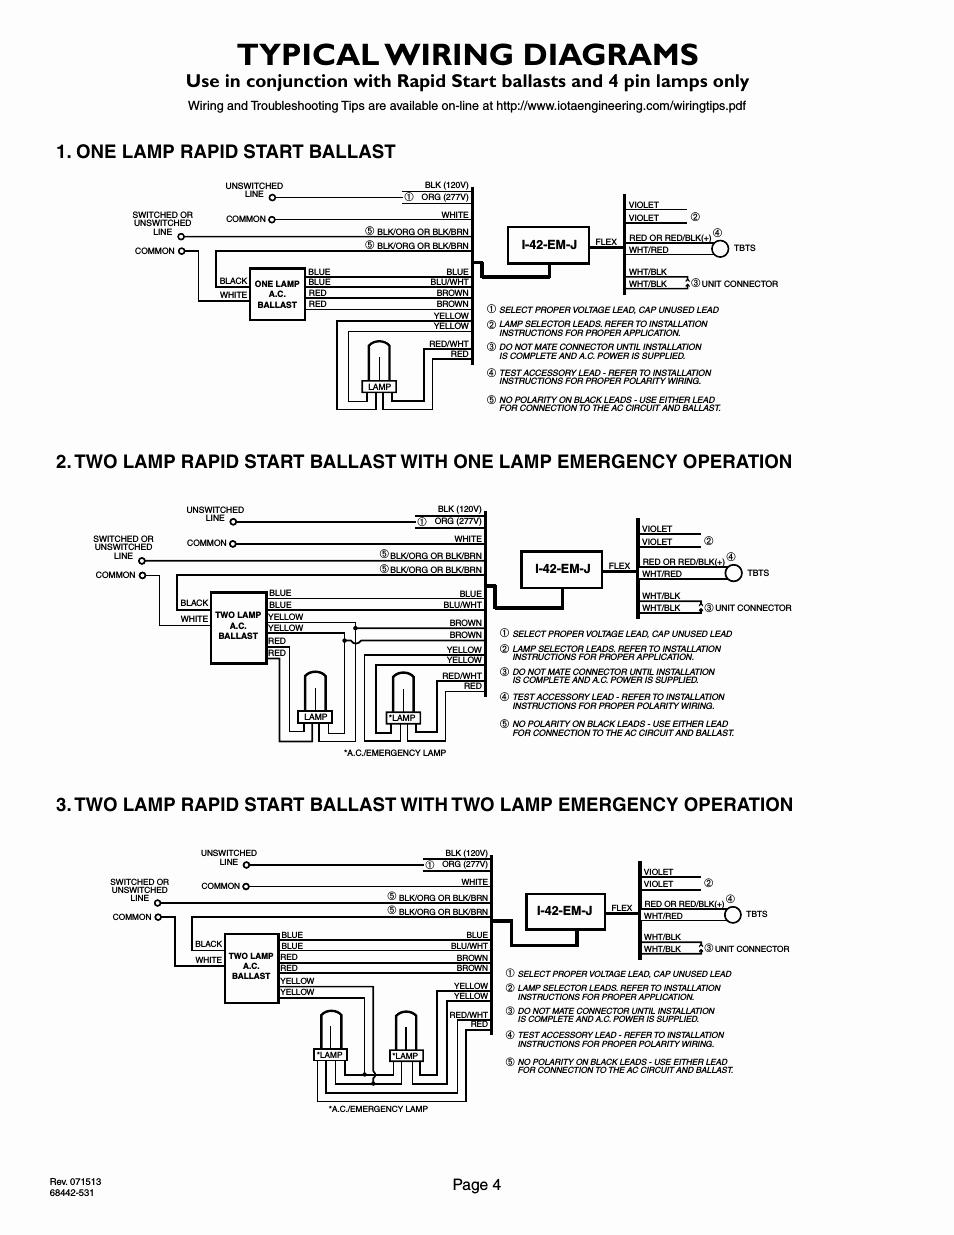 hight resolution of iota emergency ballast wiring diagram iota emergency ballast wiring diagram full size wiring diagram philips